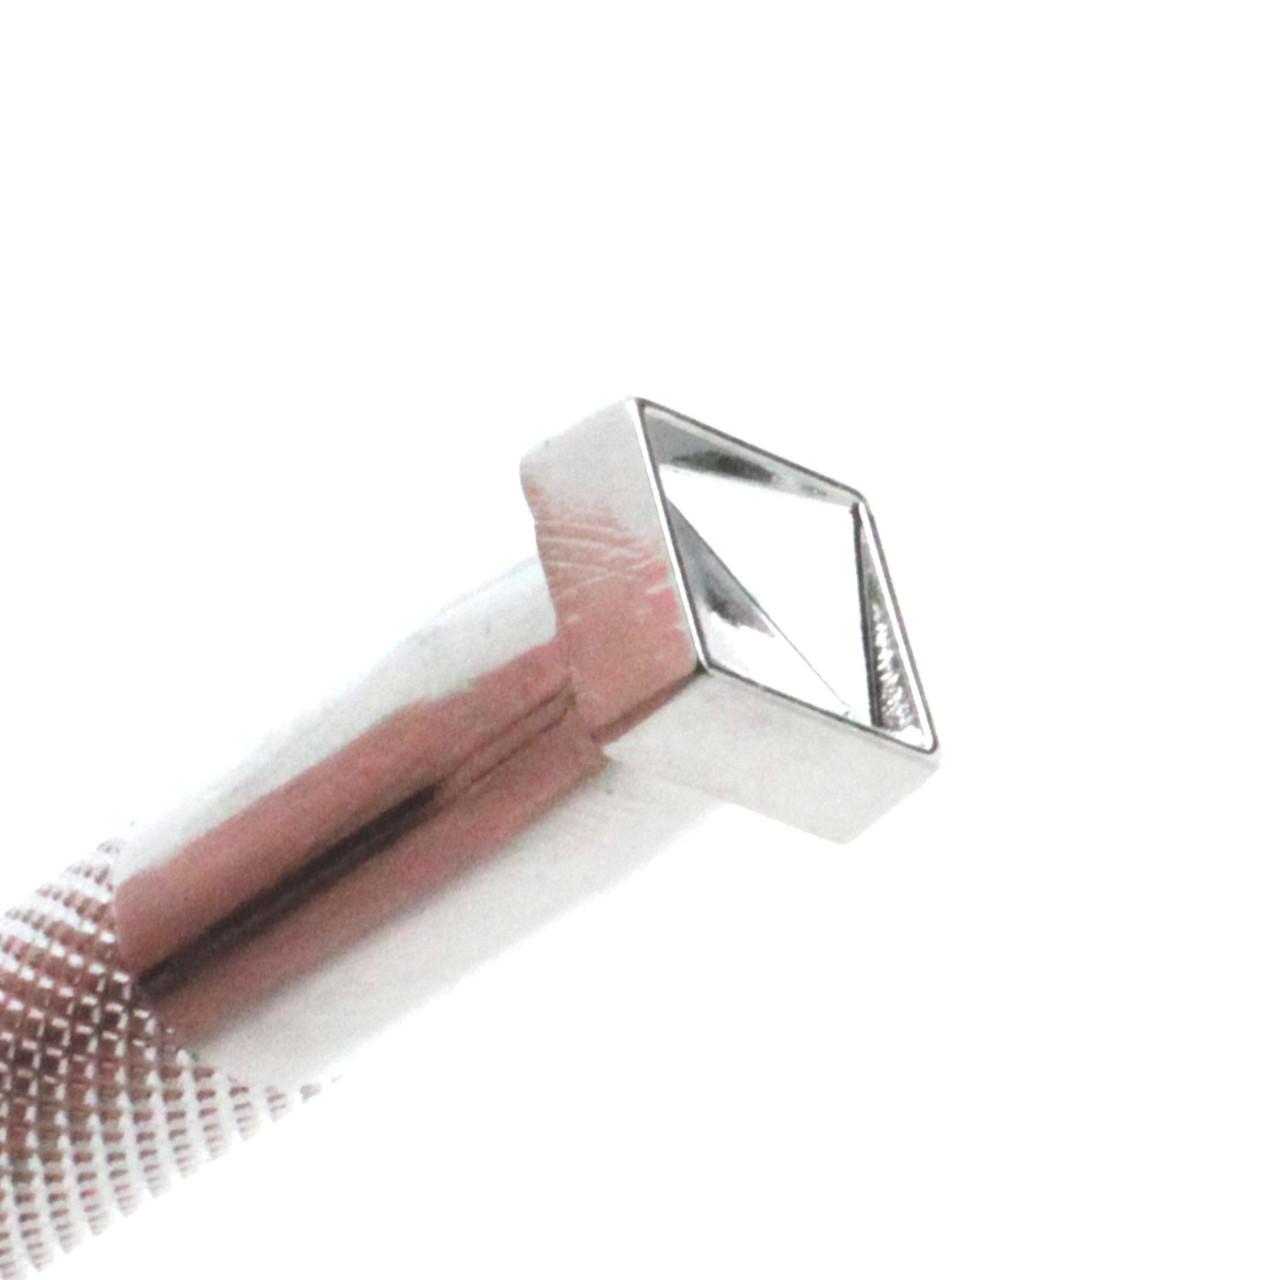 Diamond Geometric Stamp Tool S722 Head